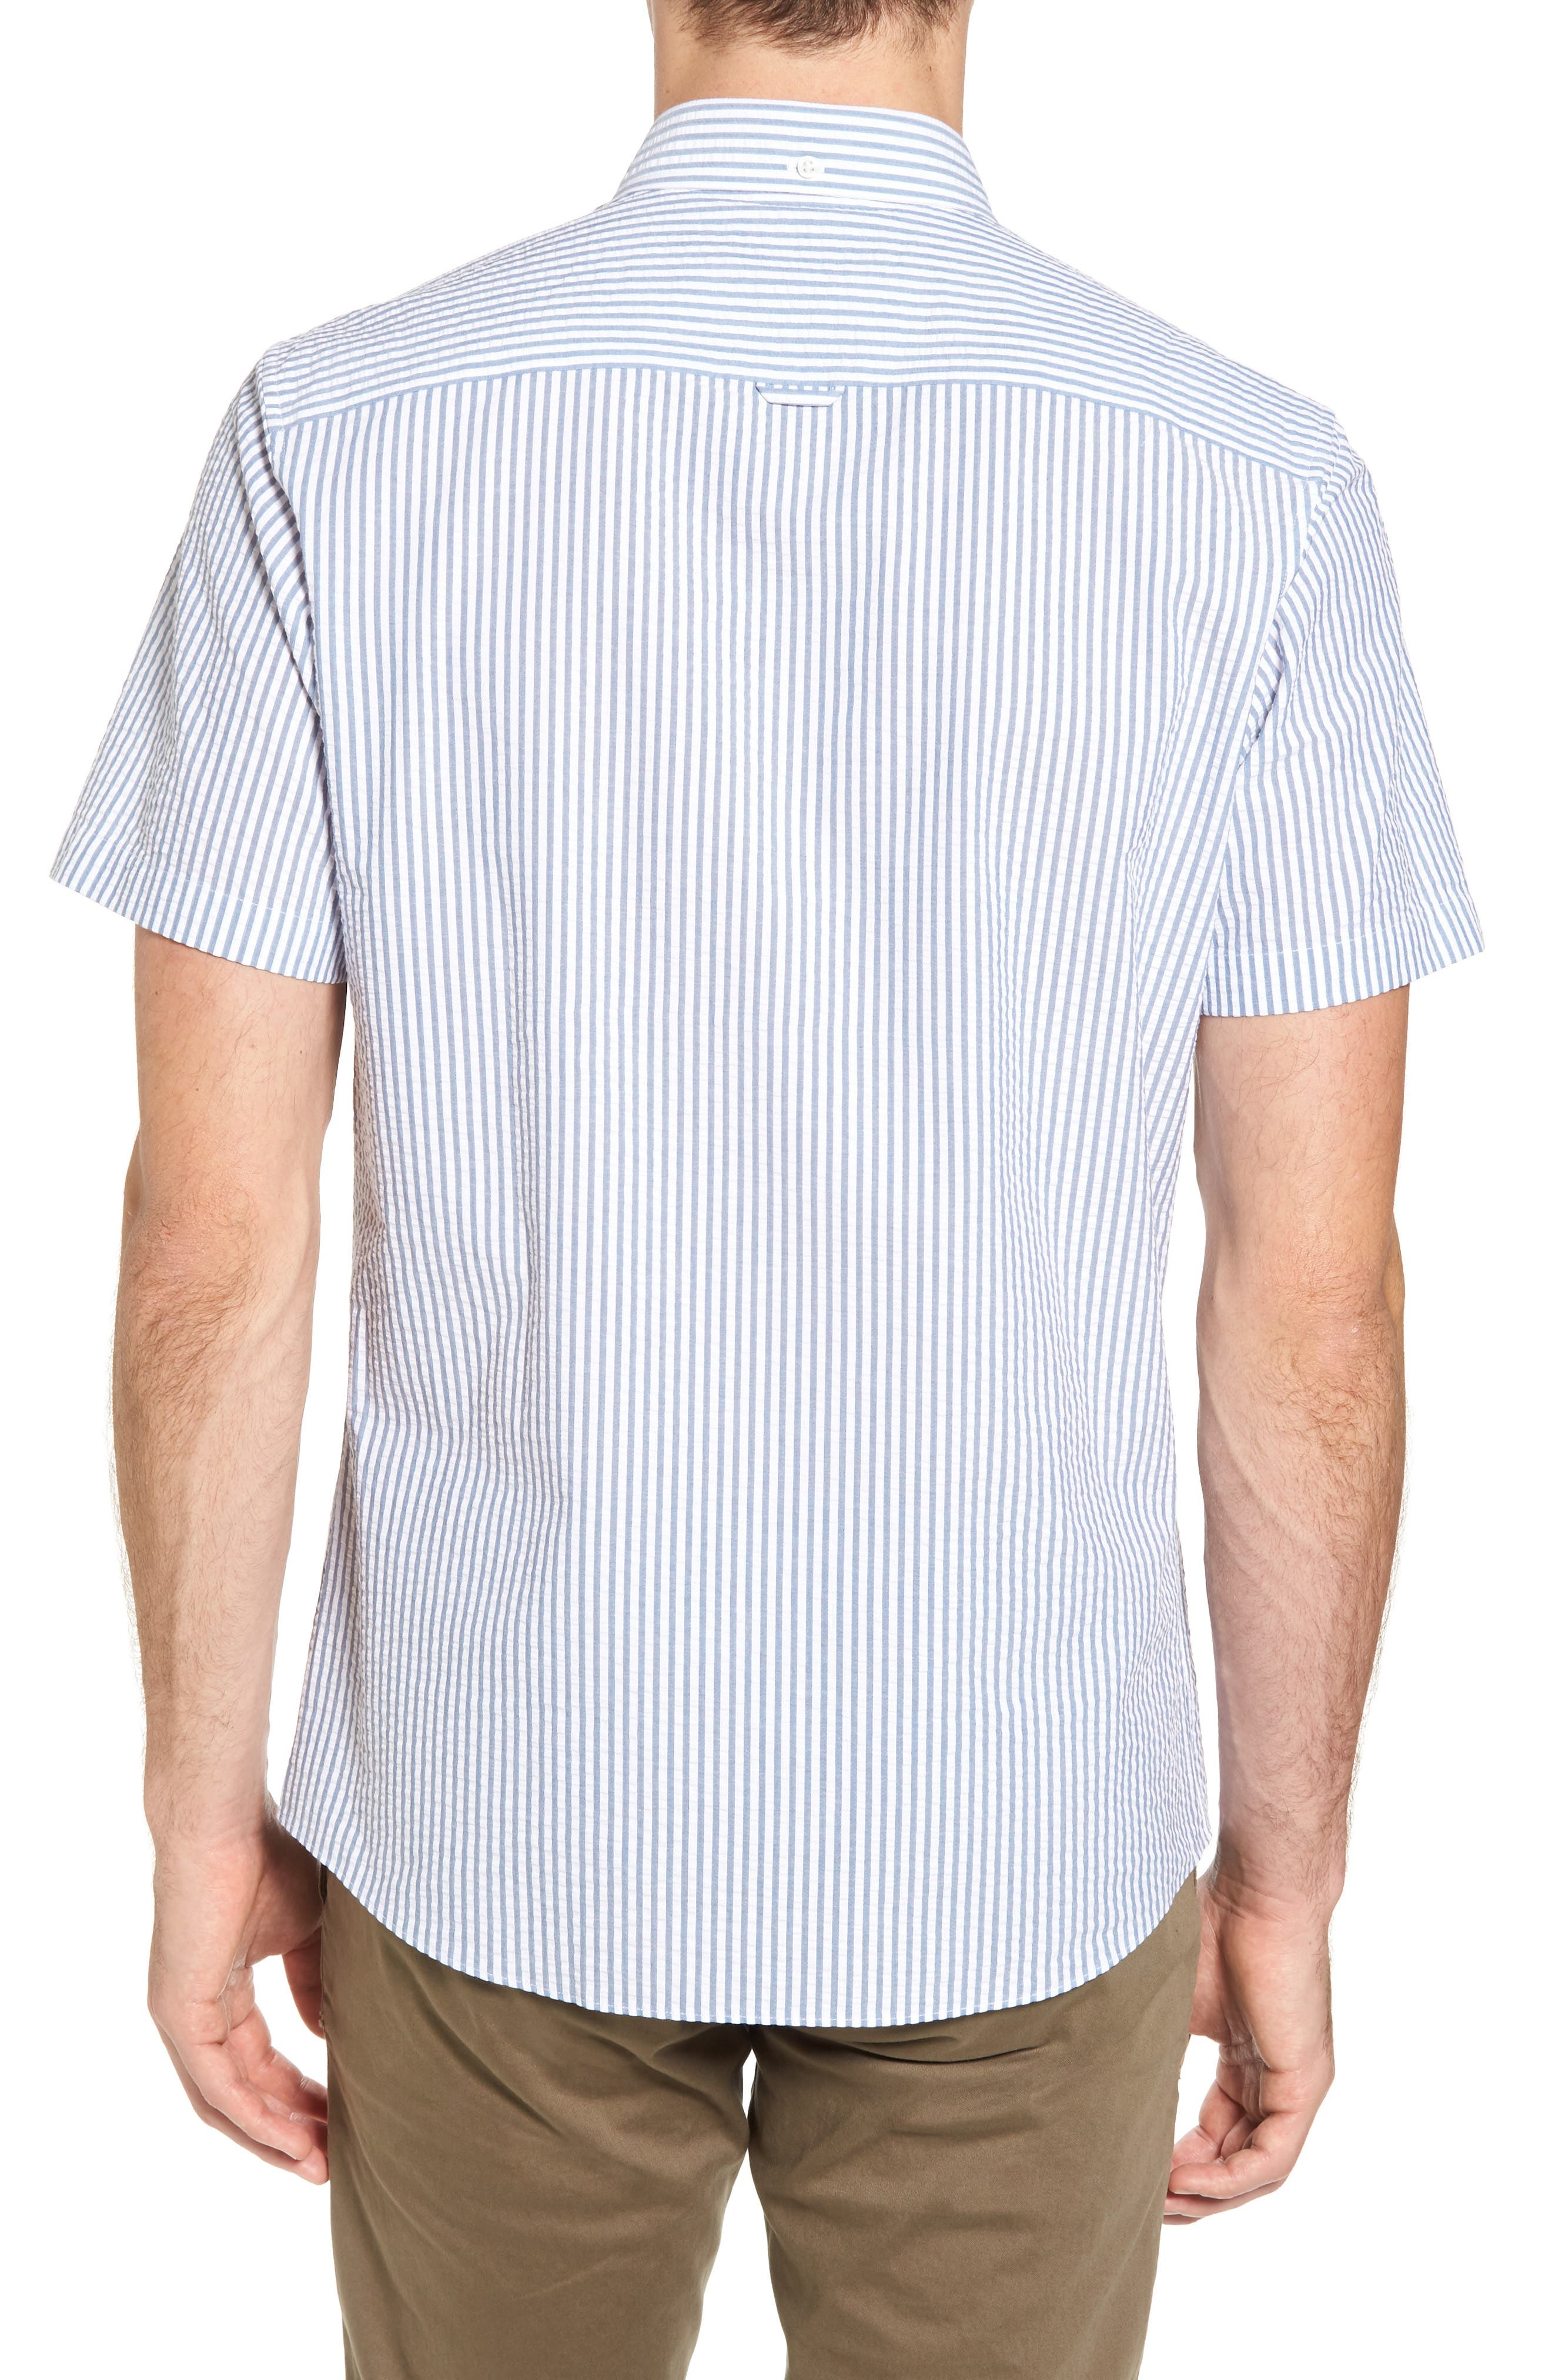 Trim Fit Seersucker Short Sleeve Sport Shirt,                             Alternate thumbnail 3, color,                             White Navy Seersucker Stripe